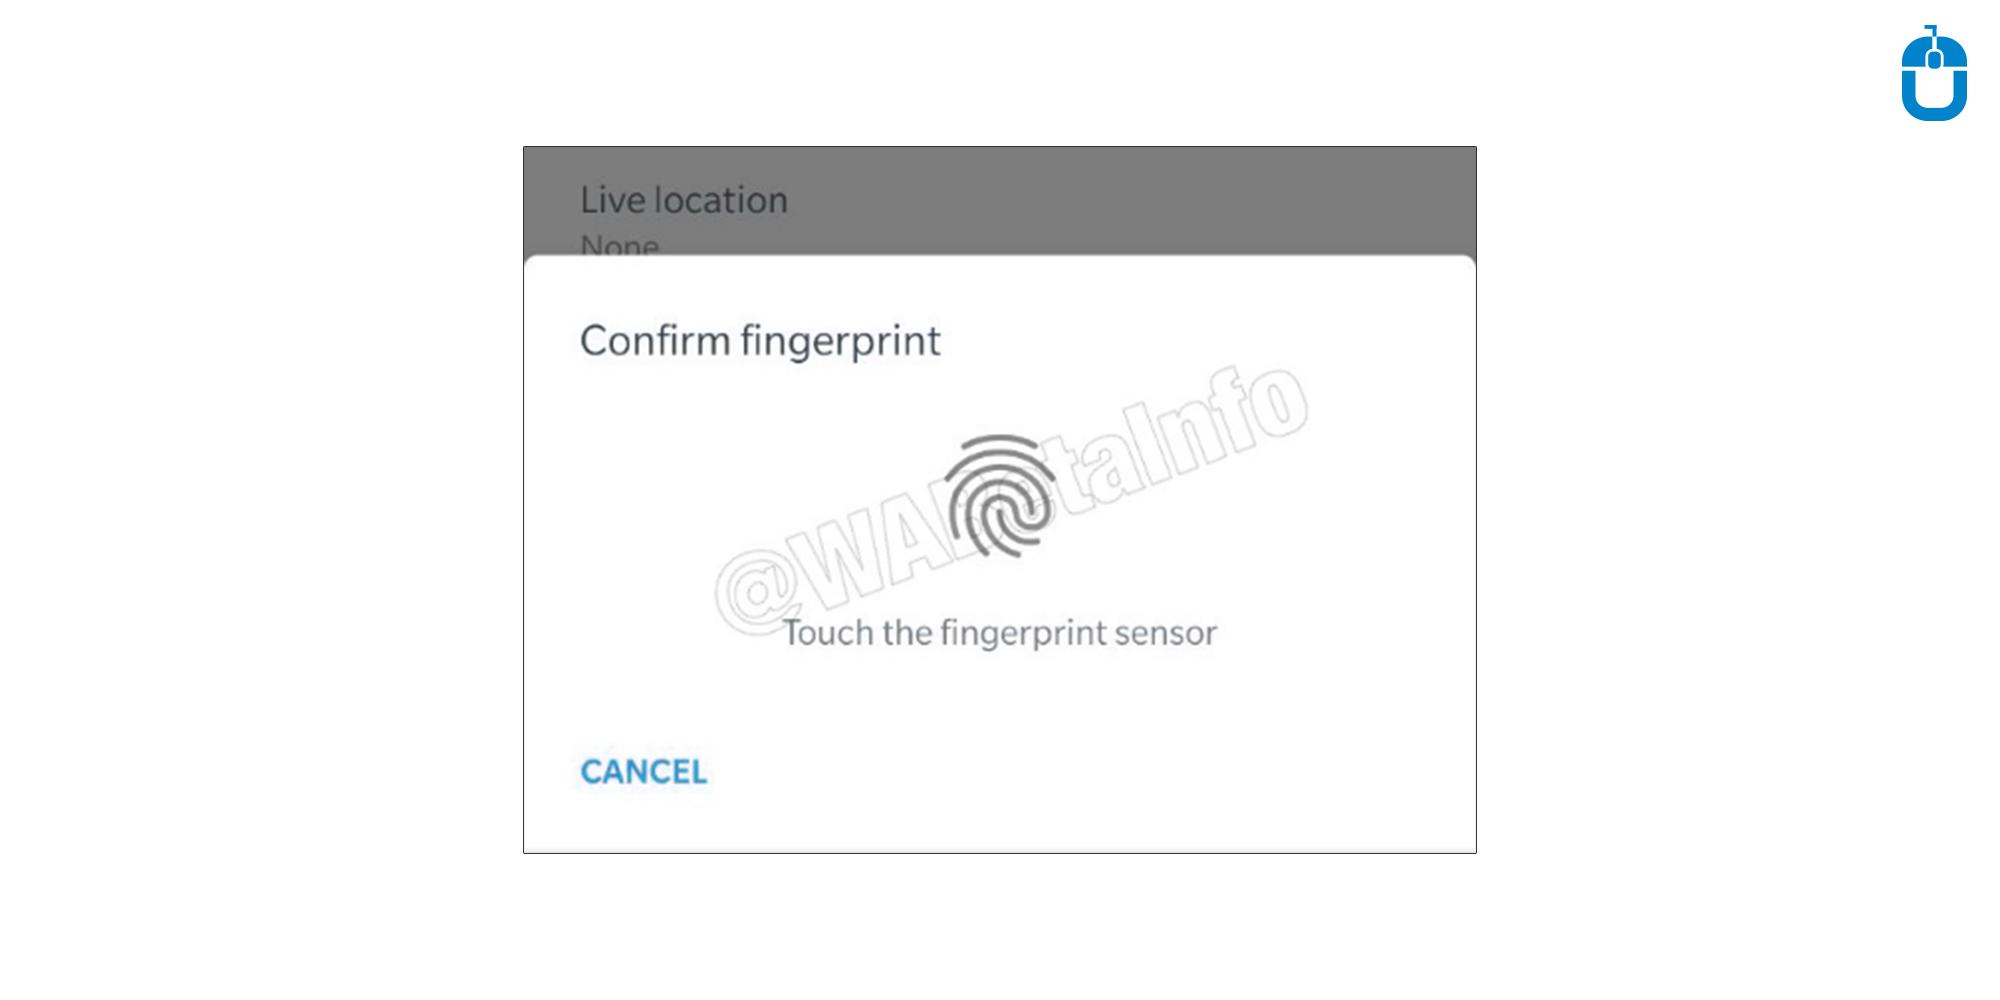 Confirm Fingerprint